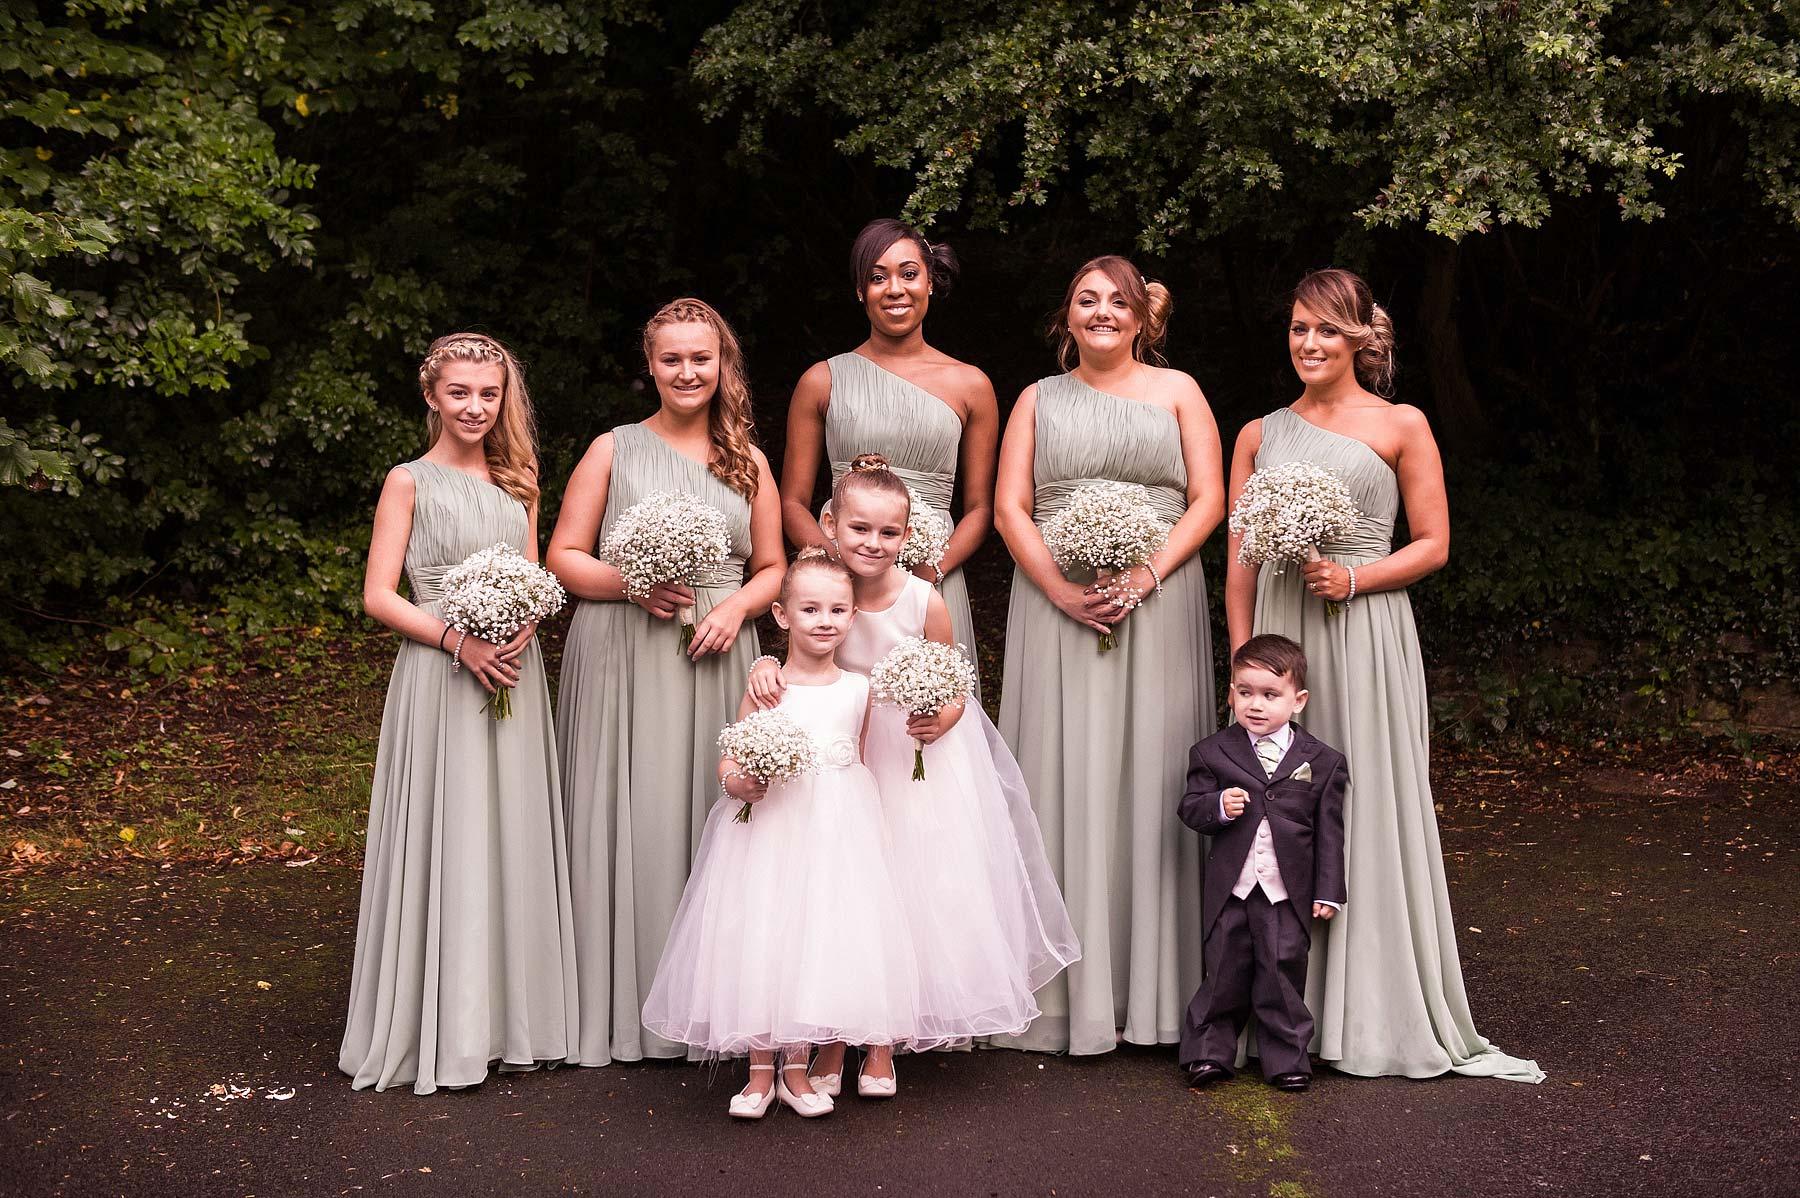 moat-house-church-wedding-photographs-011